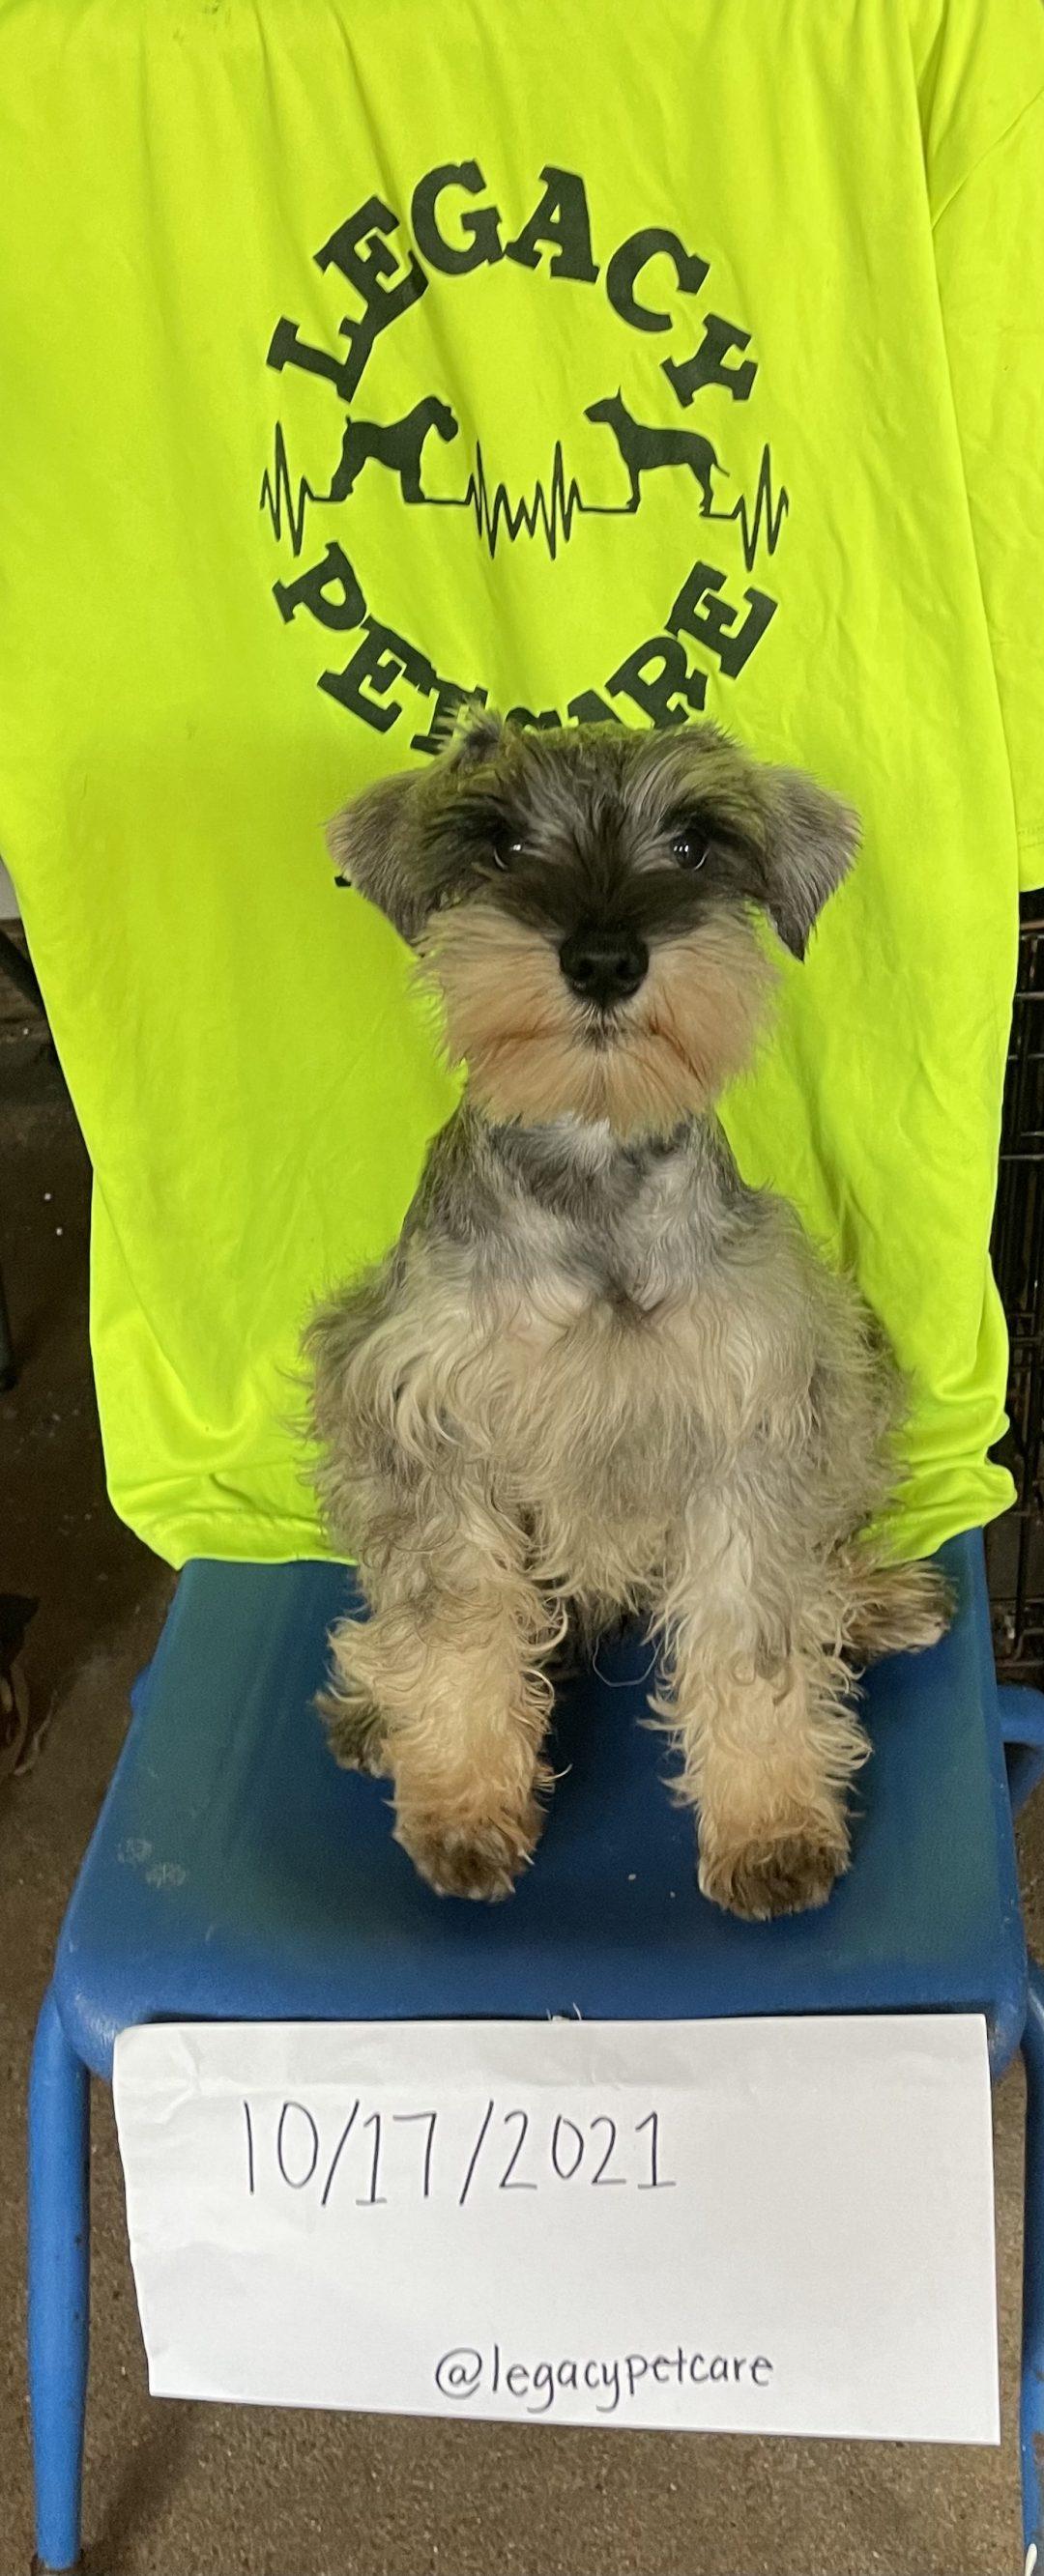 Wolfgang -Flawless Salt and Pepper - AKC Mini Schnauzer male doggie for sale near Houston, Texas